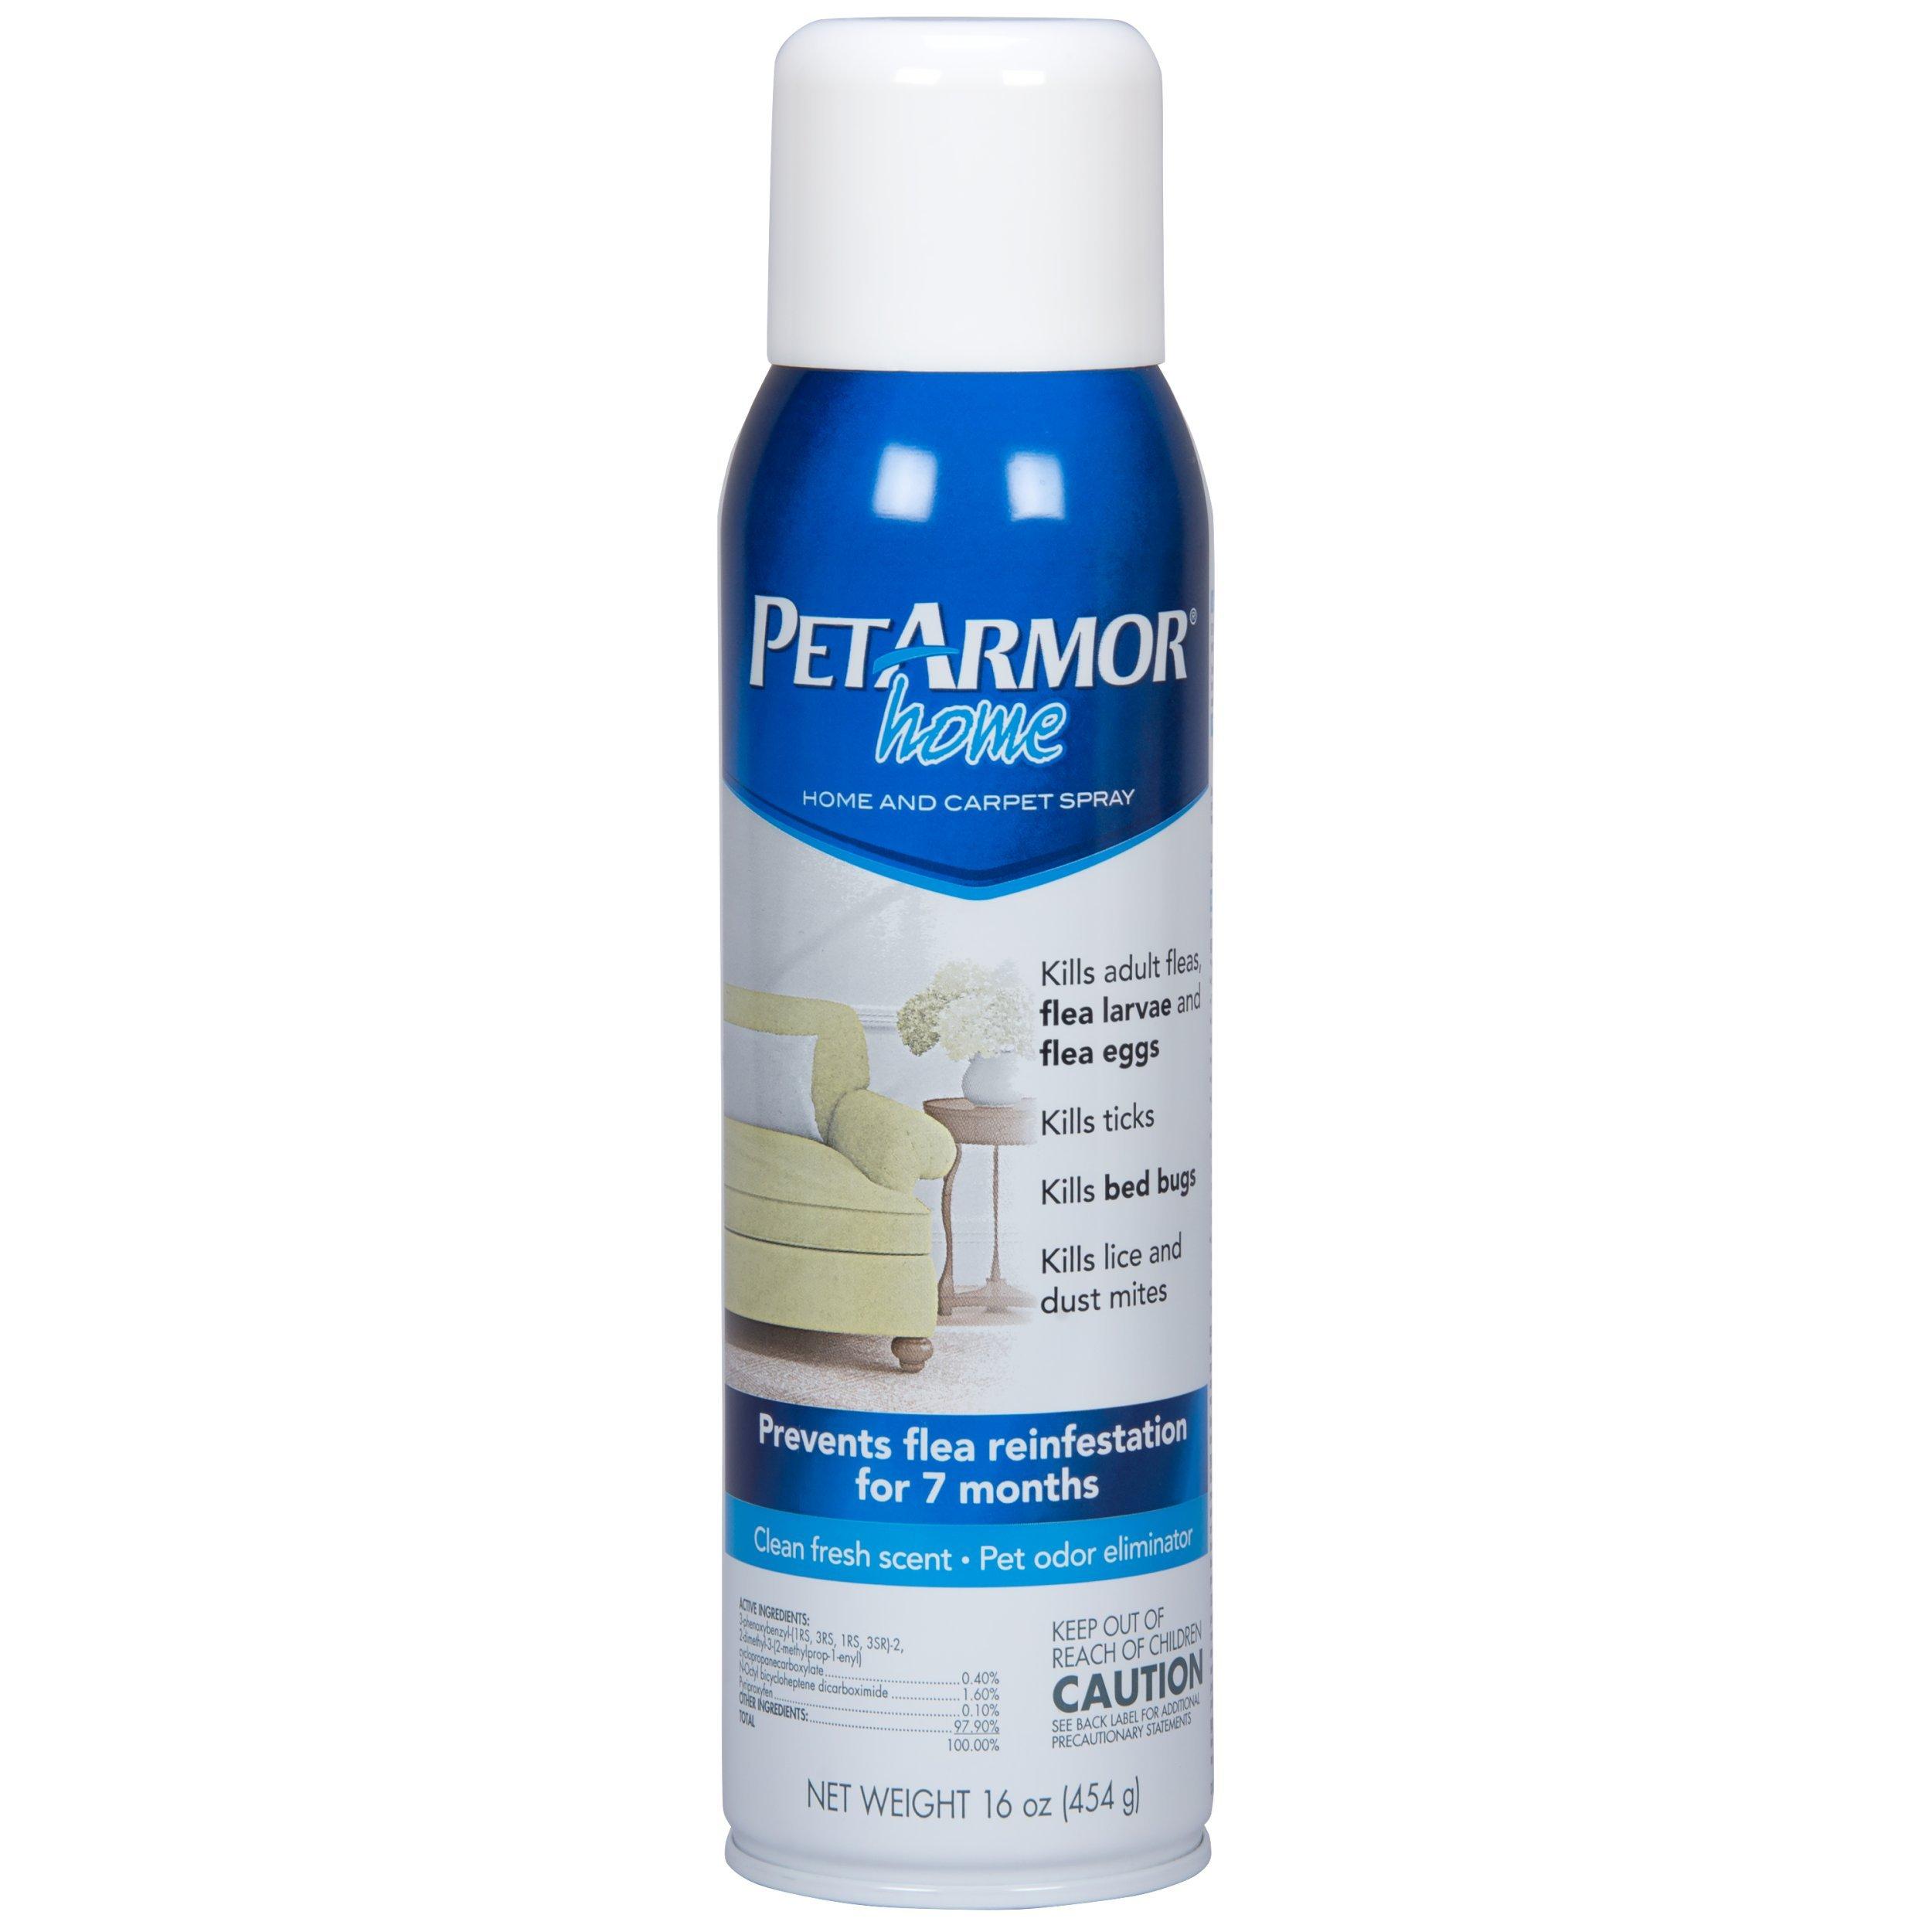 PETARMOR Home and Carpet Spray for Fleas and Ticks, Protect Your Home From Fleas and Eliminate Pet Odor, 16 Ounce by PETARMOR